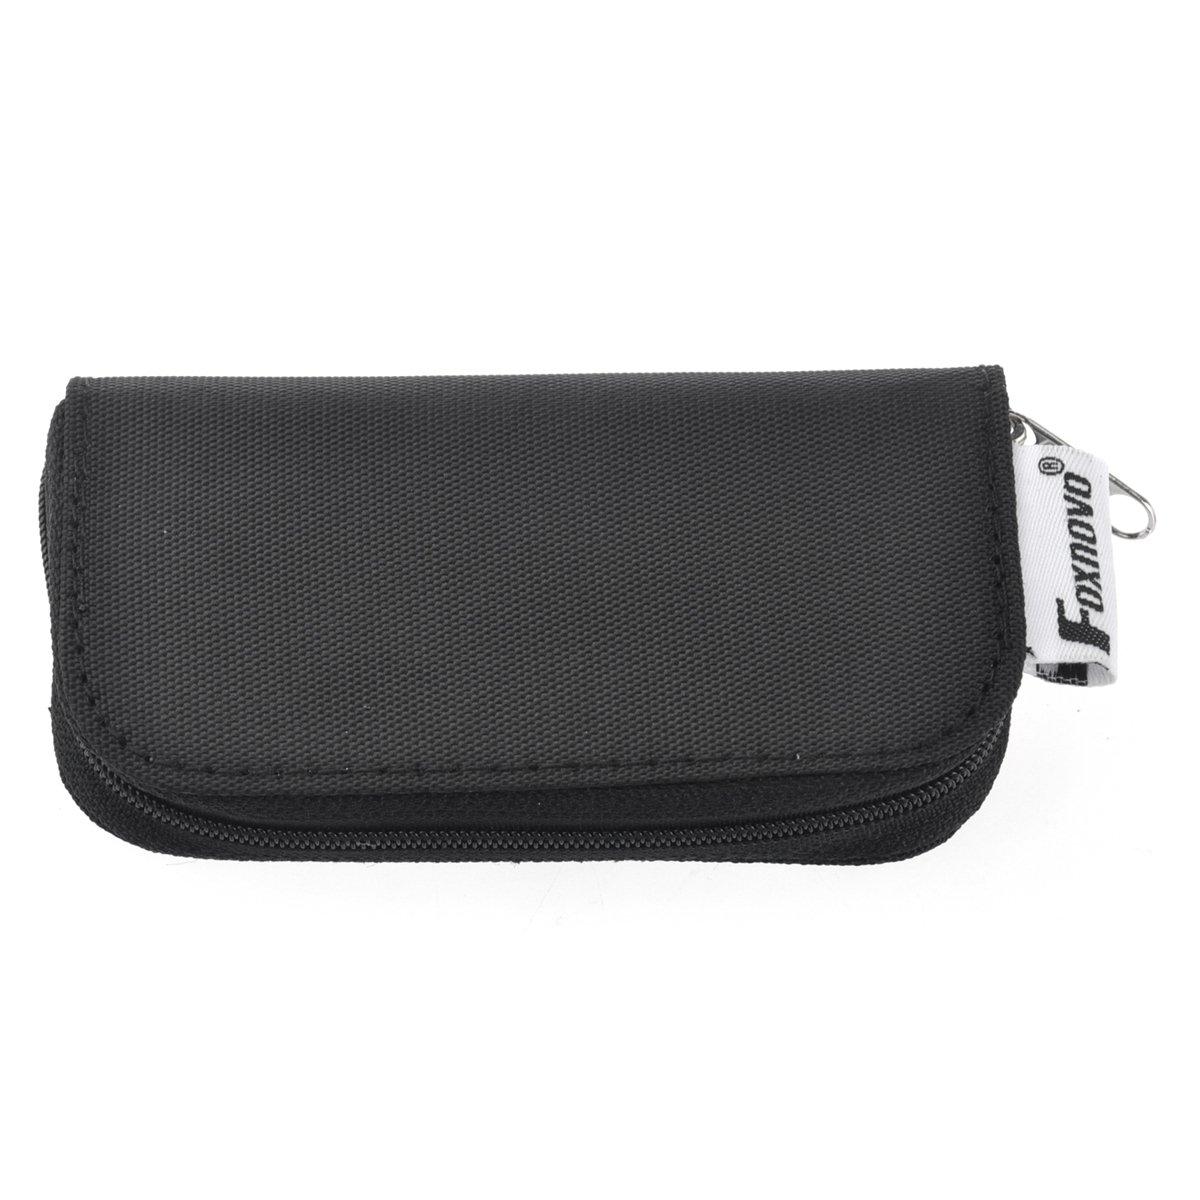 Foxnovo Portable 22 Slots SD SDHC MMC CF Micro SD Memory Card Holder Pouch Case Zippered Storage Bag Protector